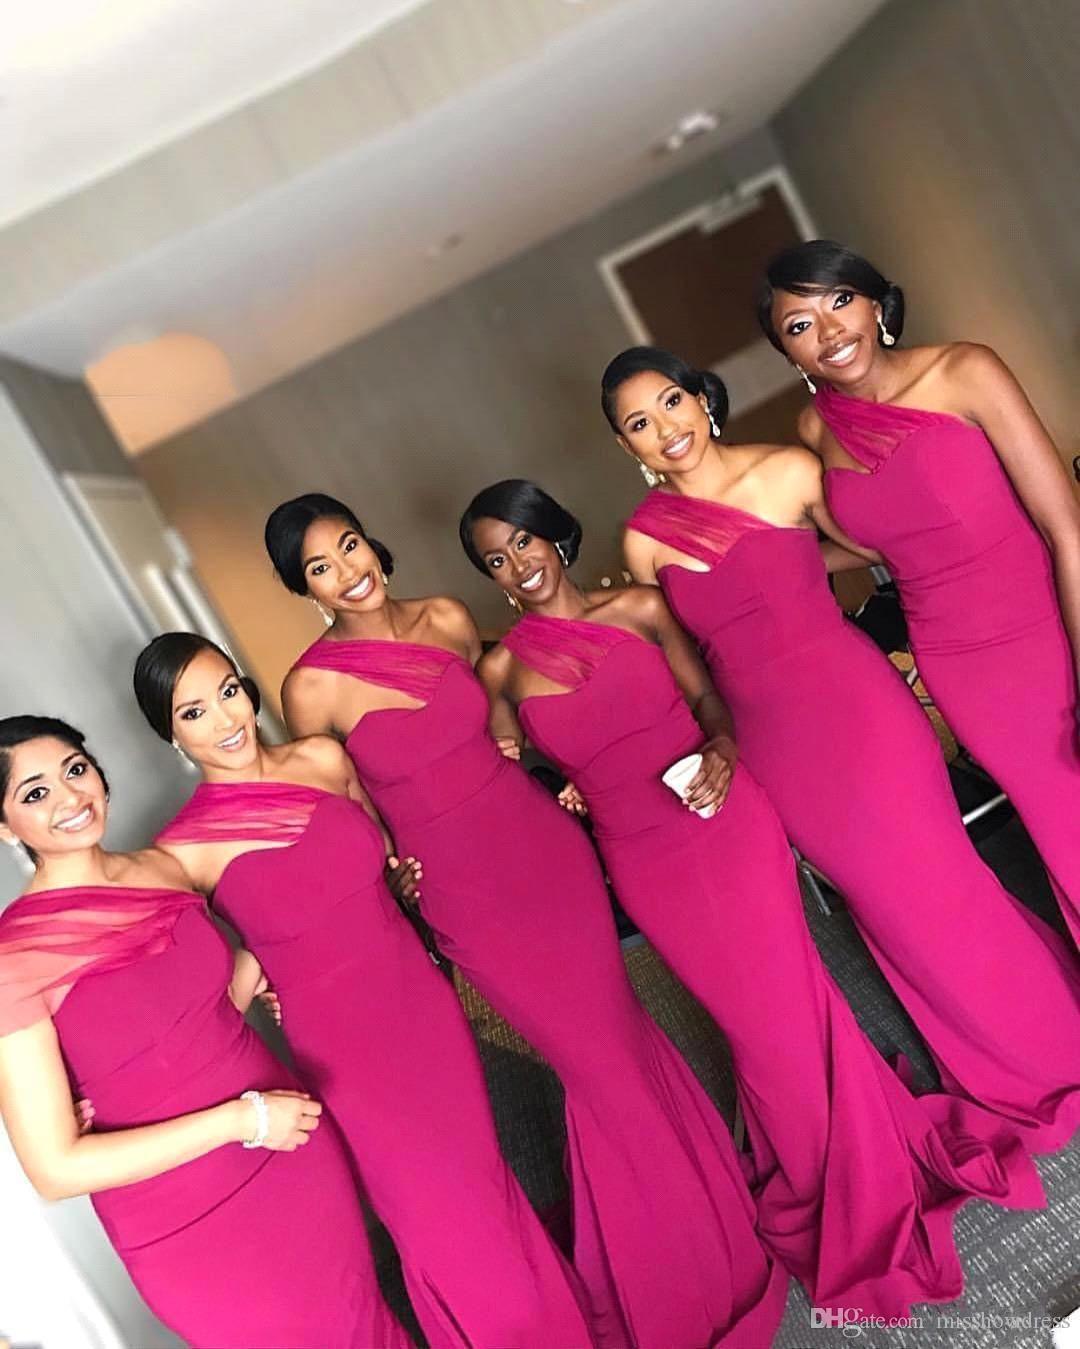 2020 New Fuchsia Mermaid Bridesmaid Dresses Elegant One Shoulder Floor Length Evening Gowns Maid Of Honors Dresses Cheap BM0861